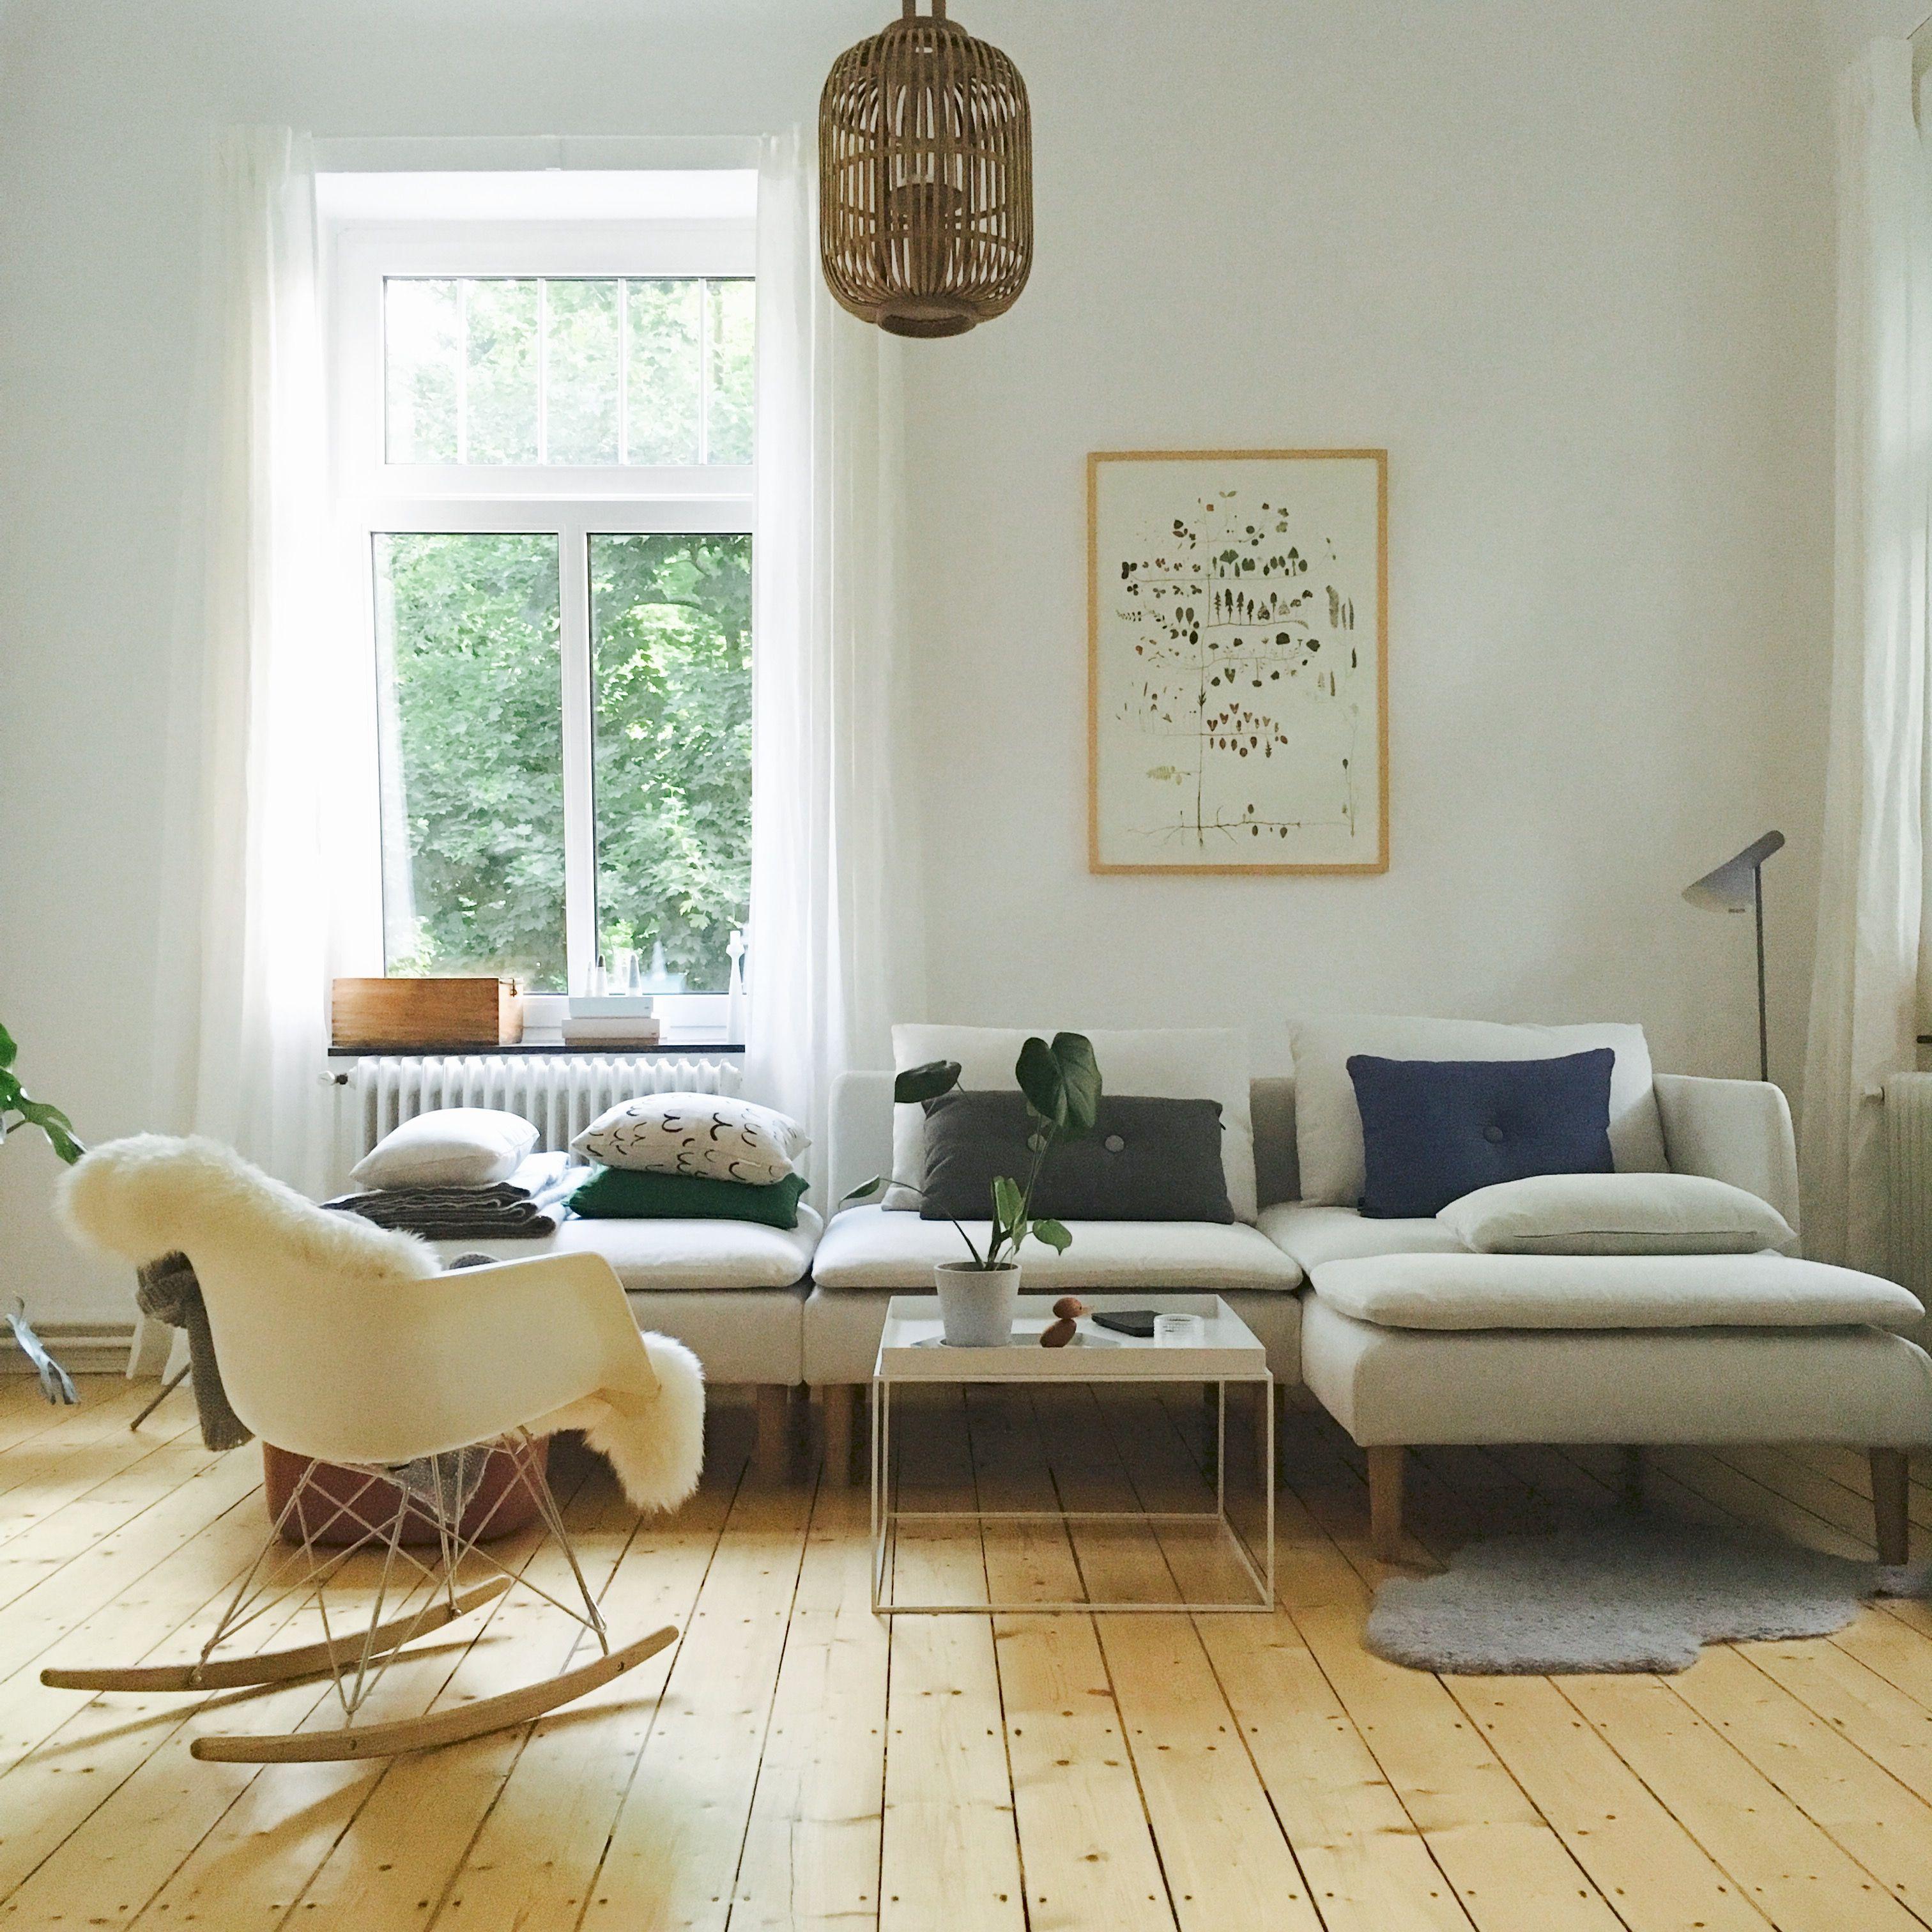 wir haben ein neues sofa relaxed in 2019 big sofas ikea living room ikea soderhamn. Black Bedroom Furniture Sets. Home Design Ideas